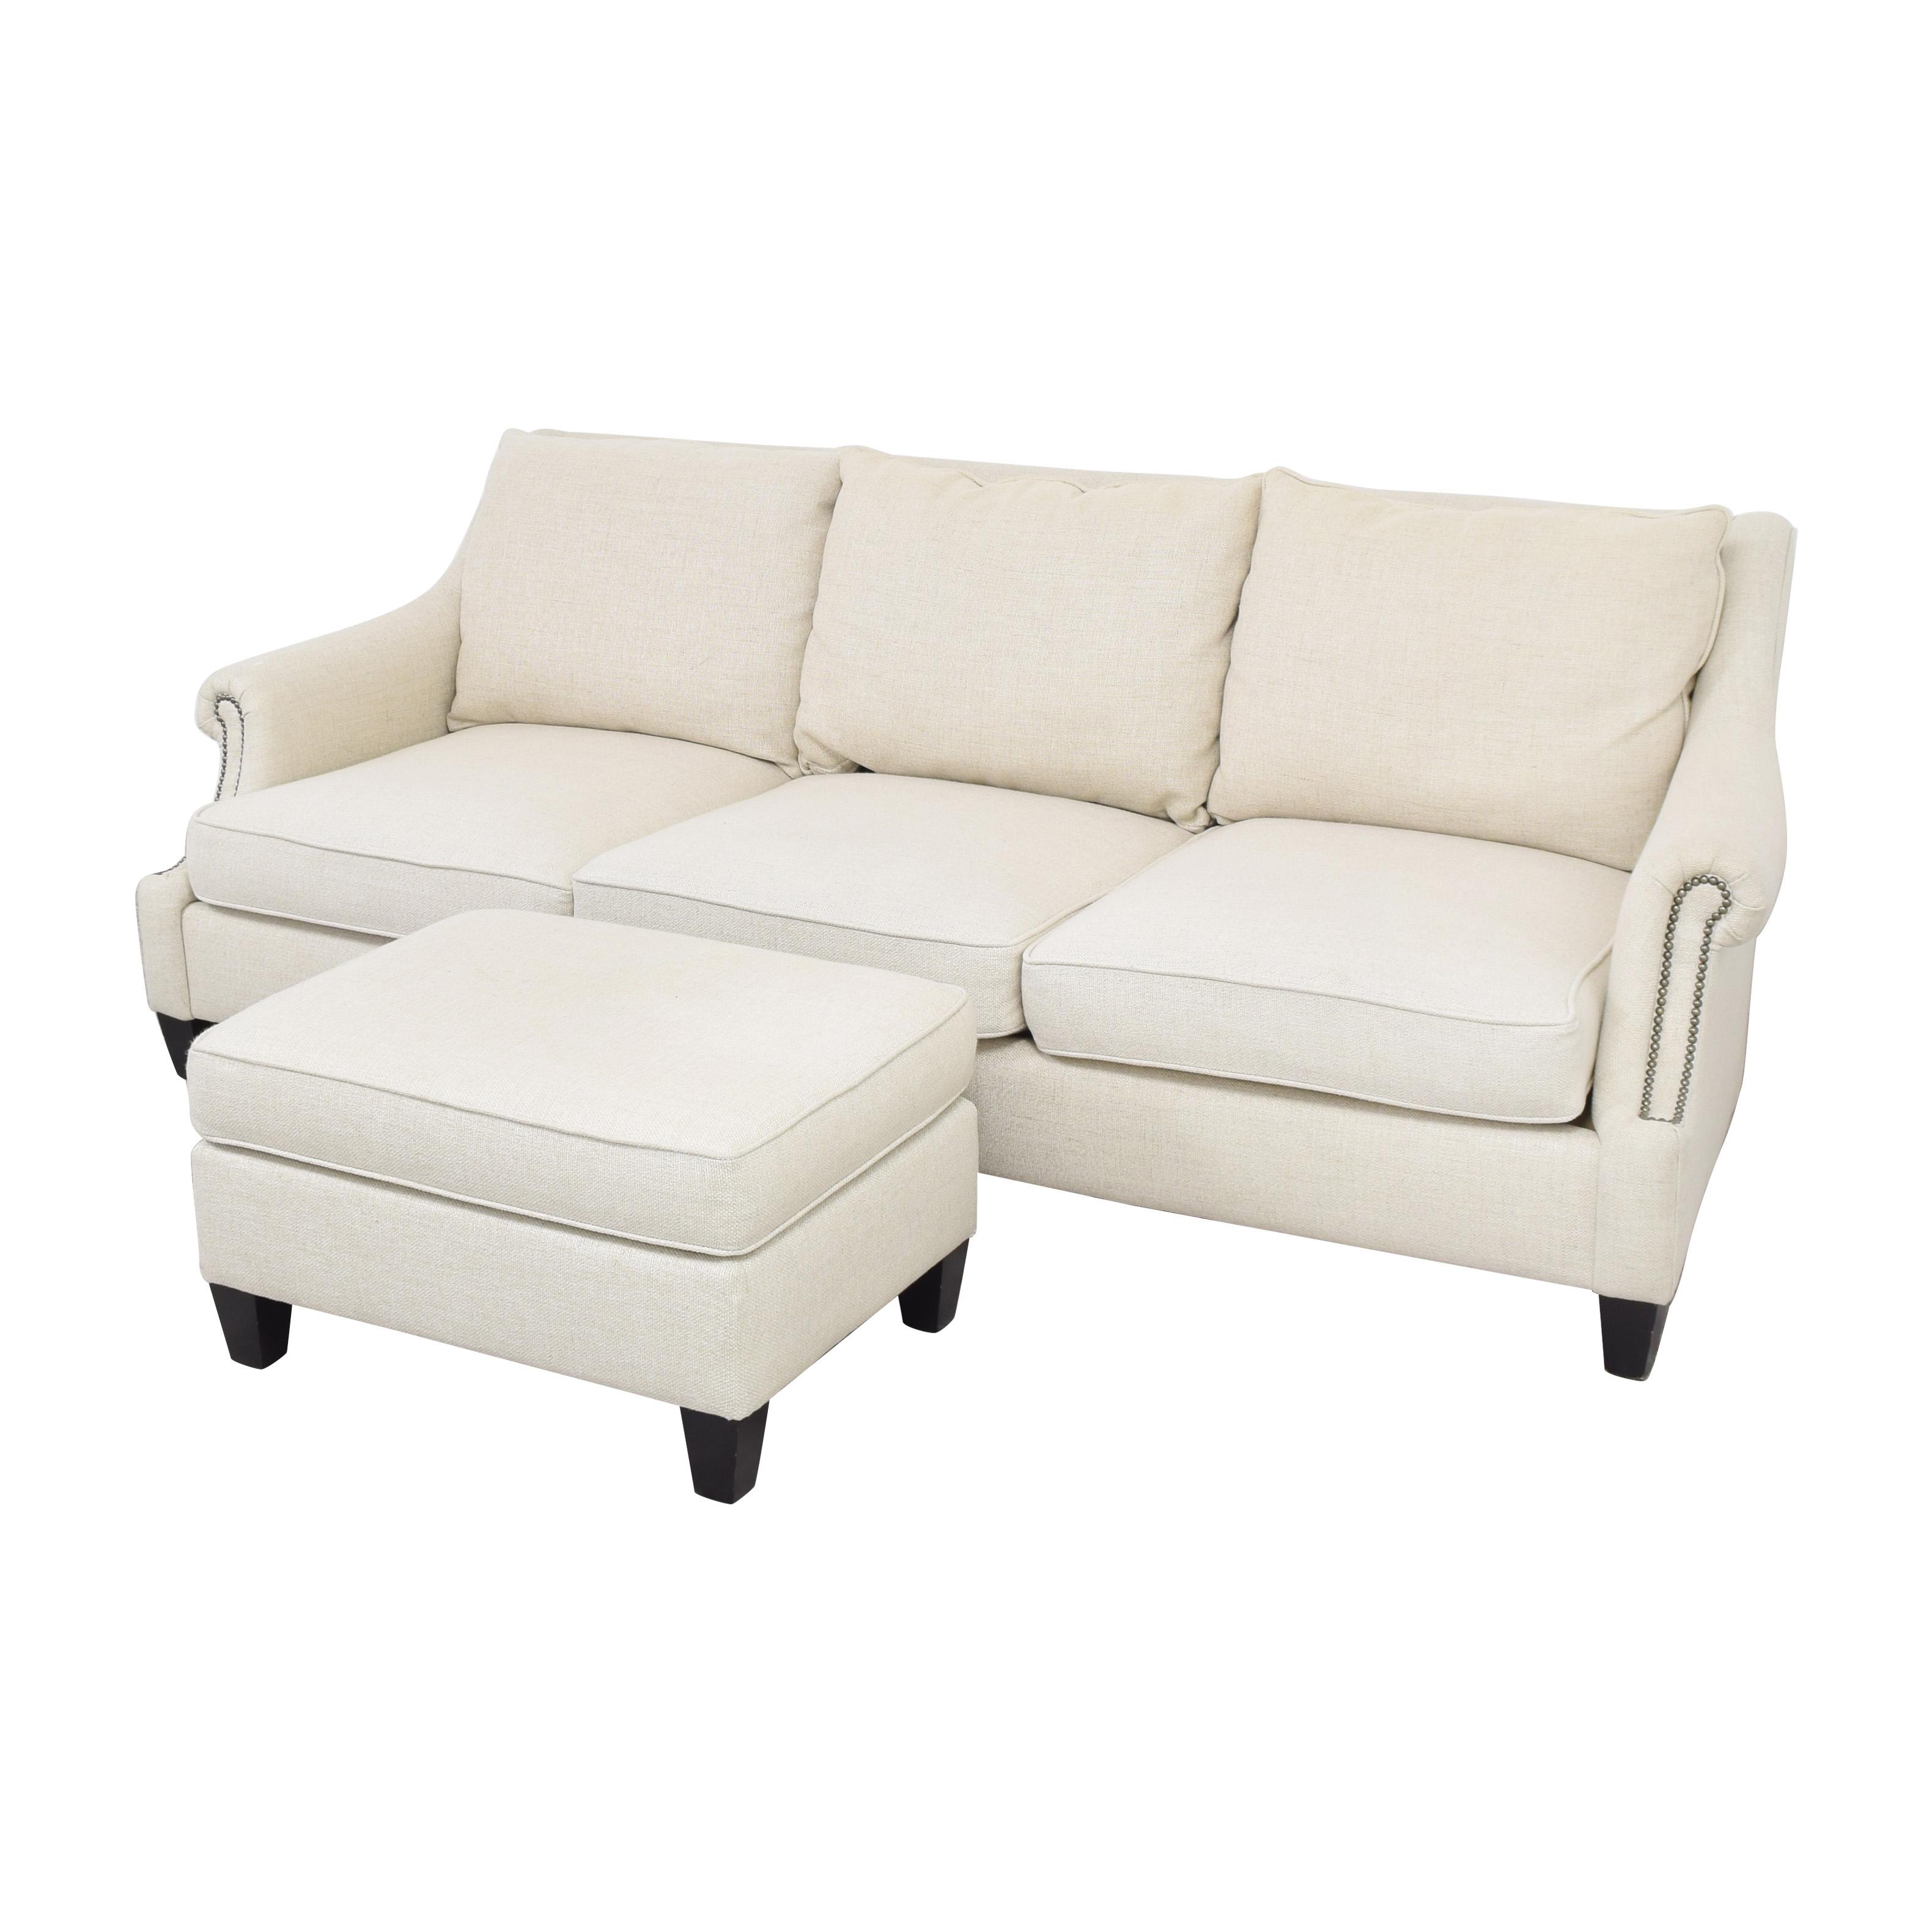 buy Raymour & Flanigan Three Cushion Sofa with Ottoman Raymour & Flanigan Classic Sofas